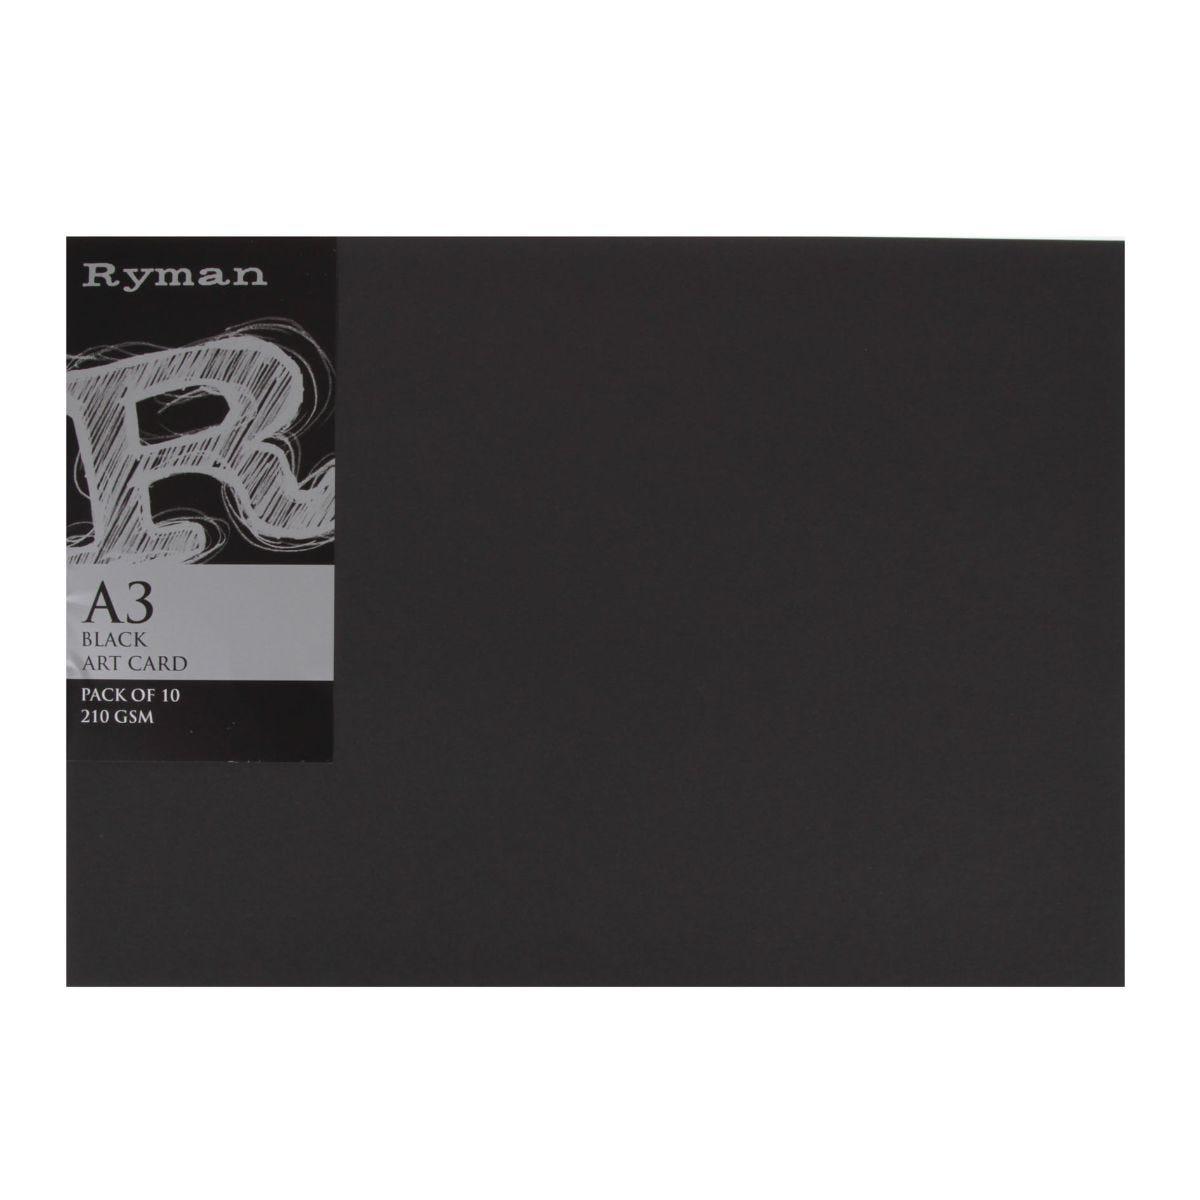 Ryman Art Card A3 210gsm Pack of 10, Black